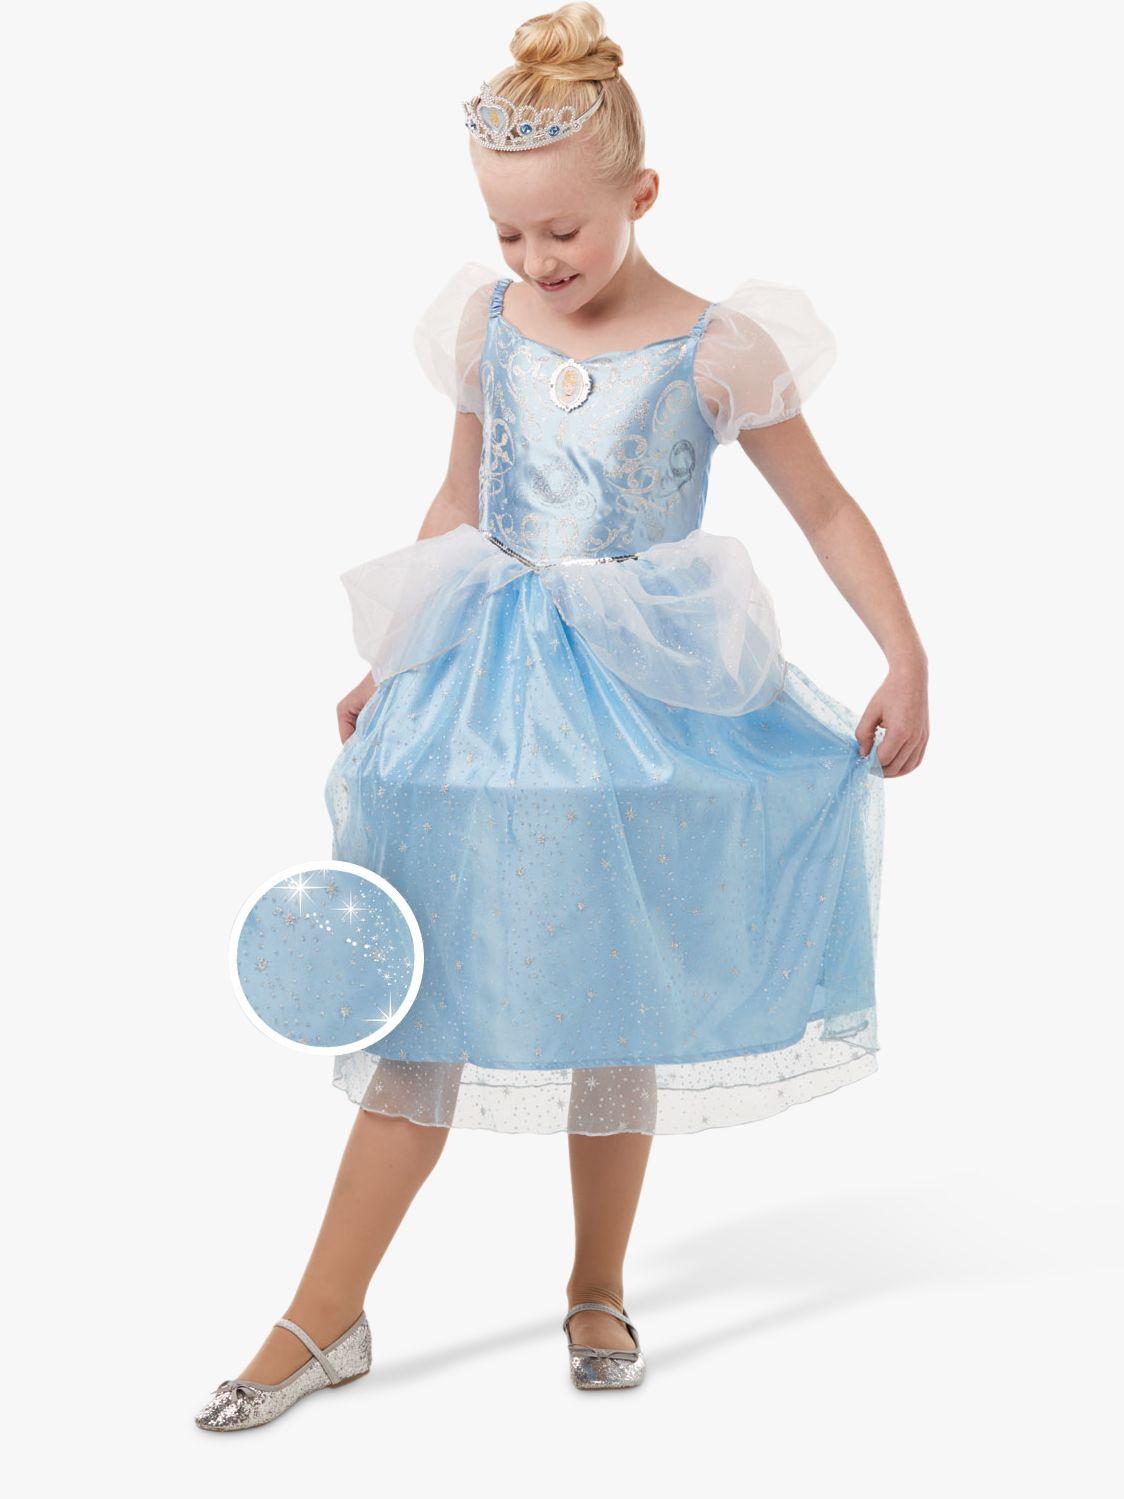 Rubies Disney Princess Cinderella Children's Costume, 5-6 years